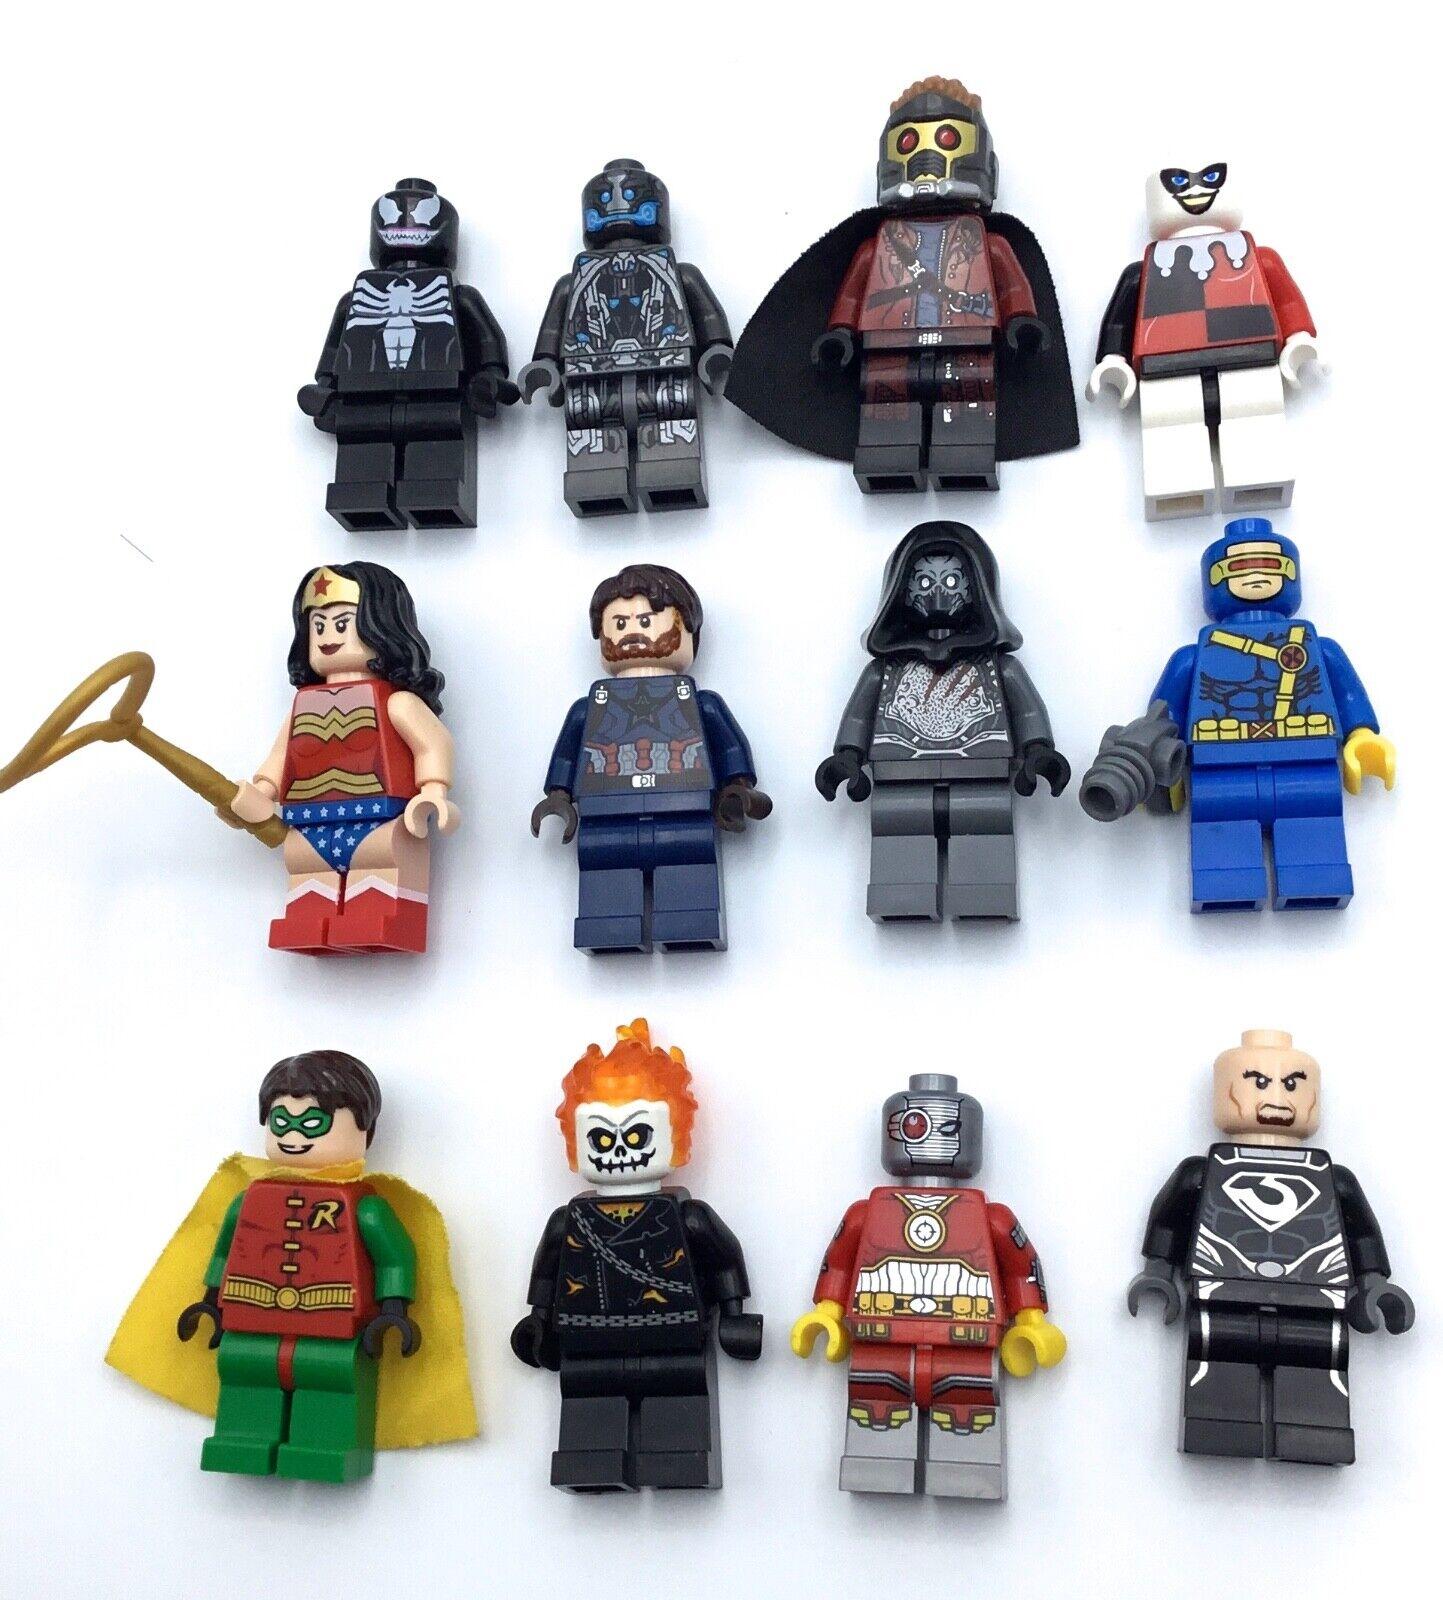 Lego Lote De 12 Minifiguras súper Héroe Mujer Maravilla Deadshot Estrella Lord Robin Raro